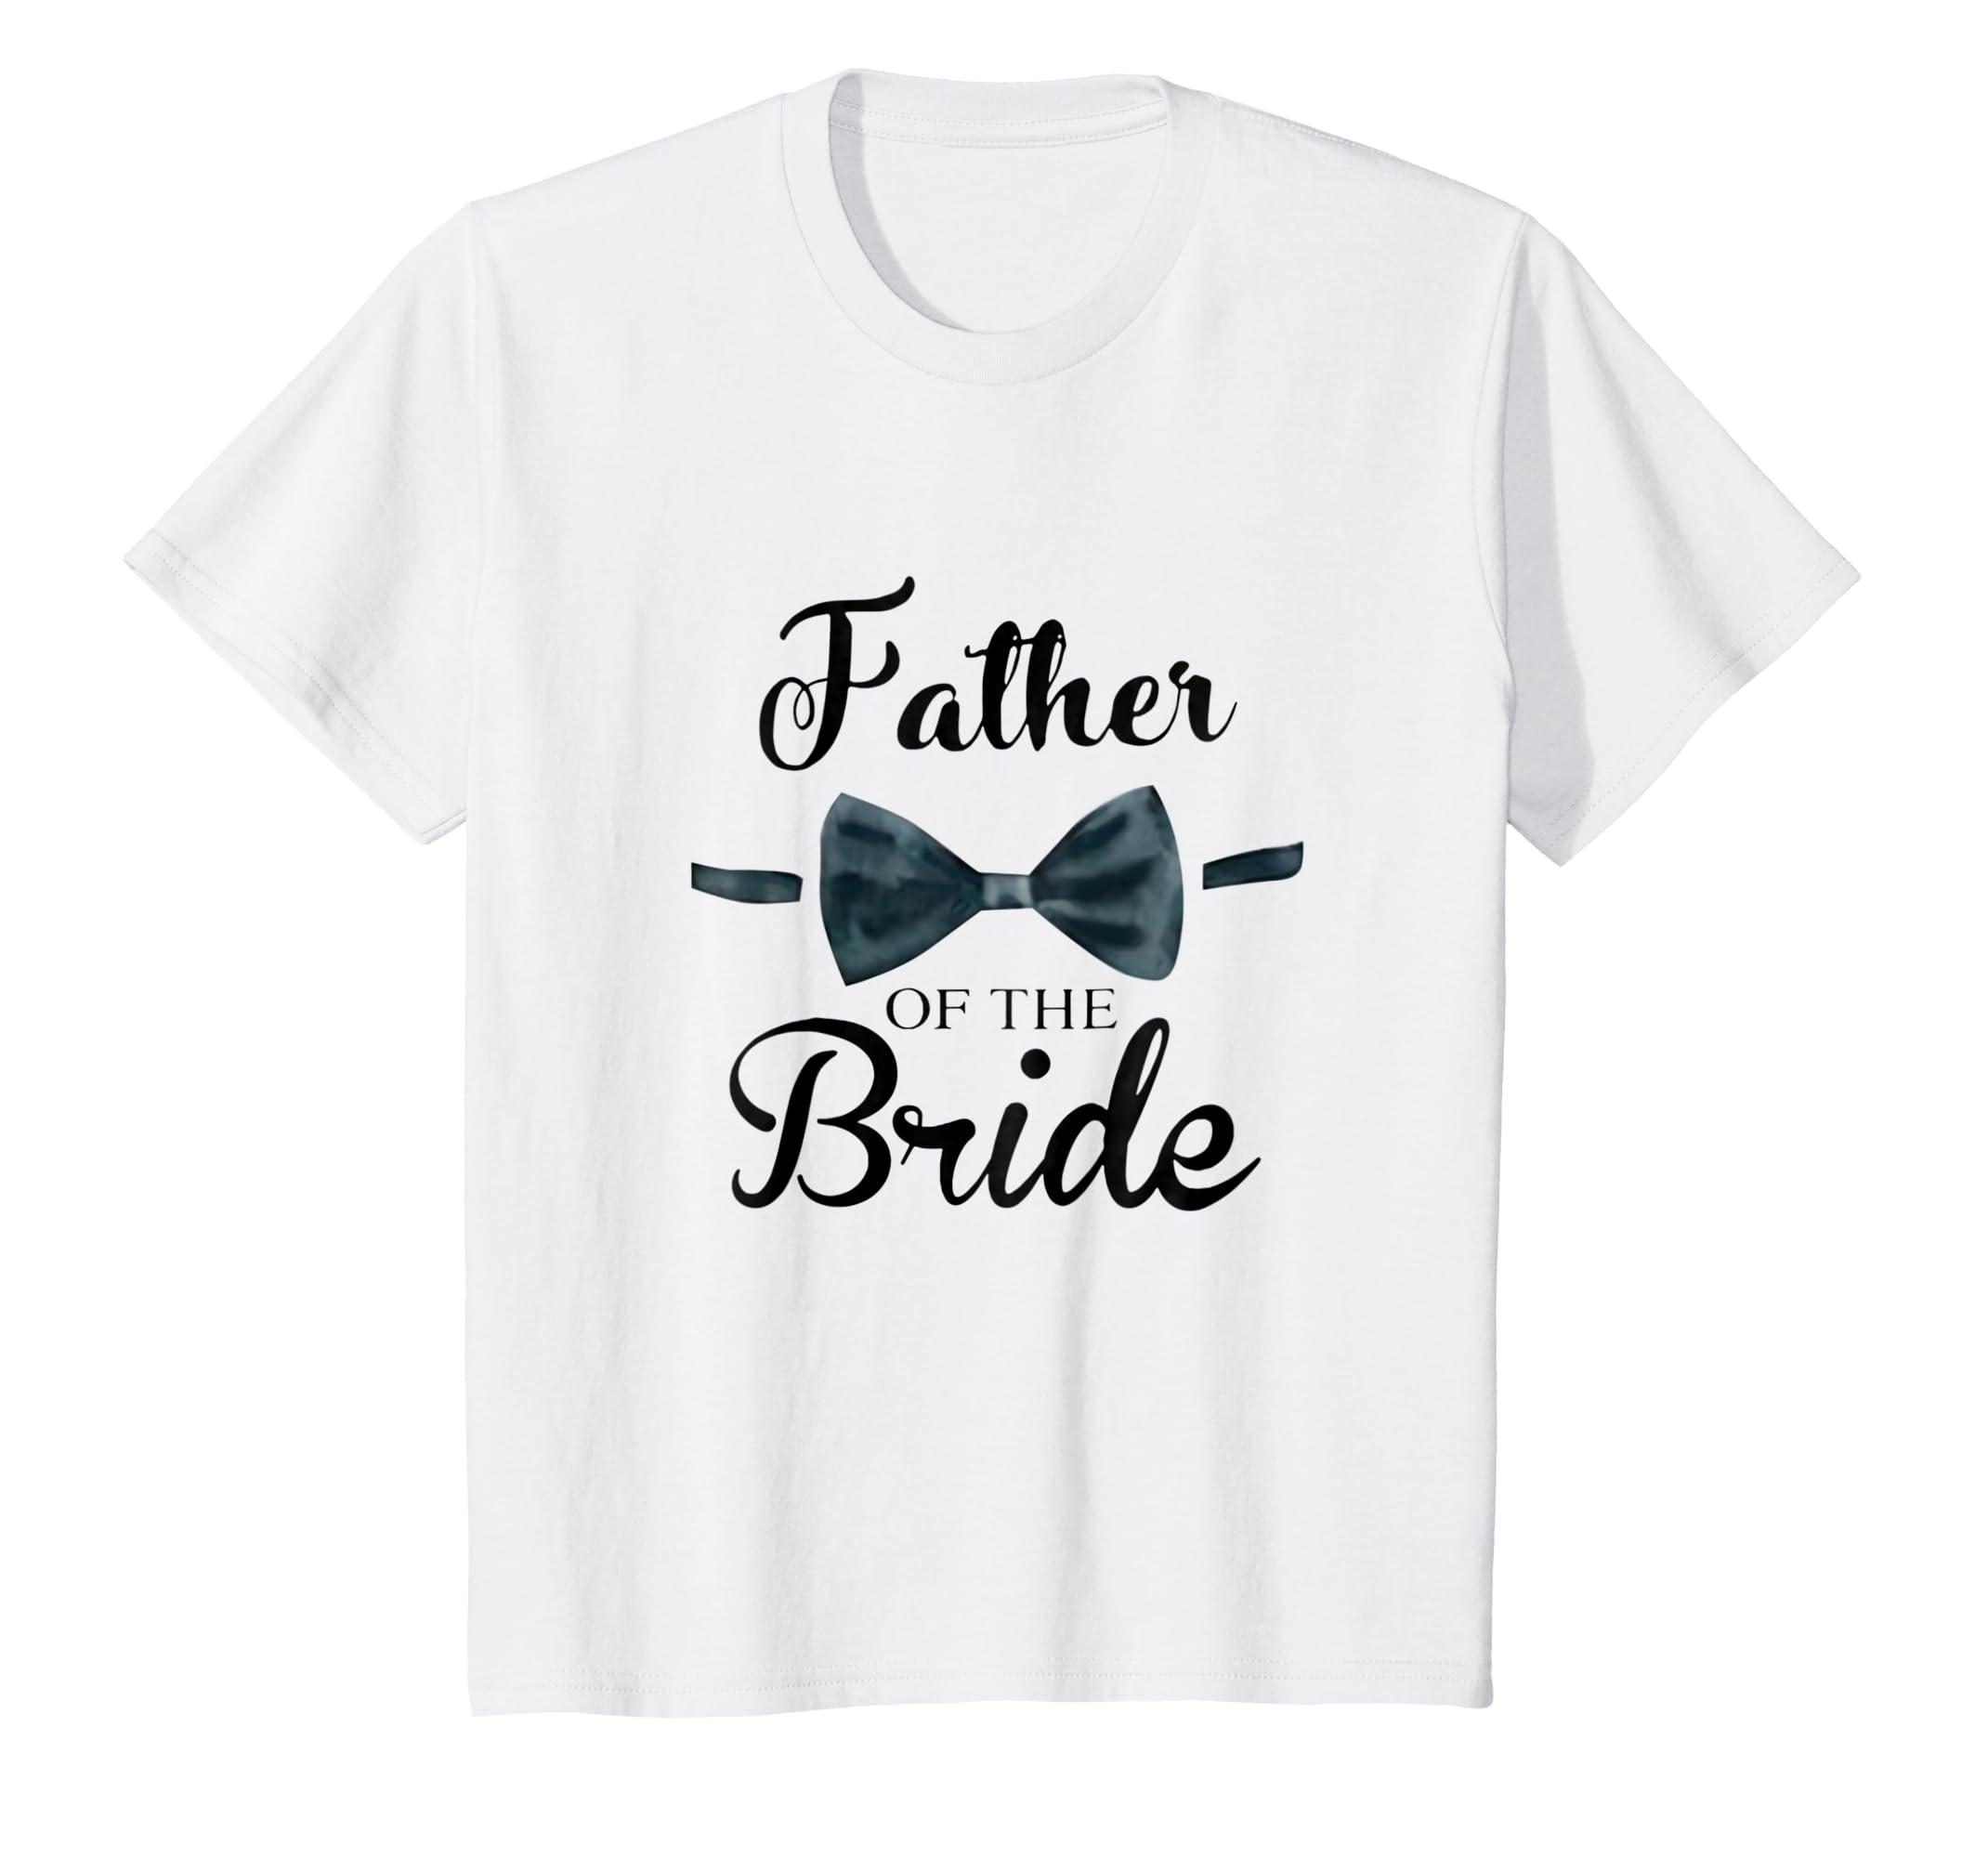 3253e0b5 Amazon.com: Father Of The Bride shirt Bridal Wedding Party Gift: Clothing